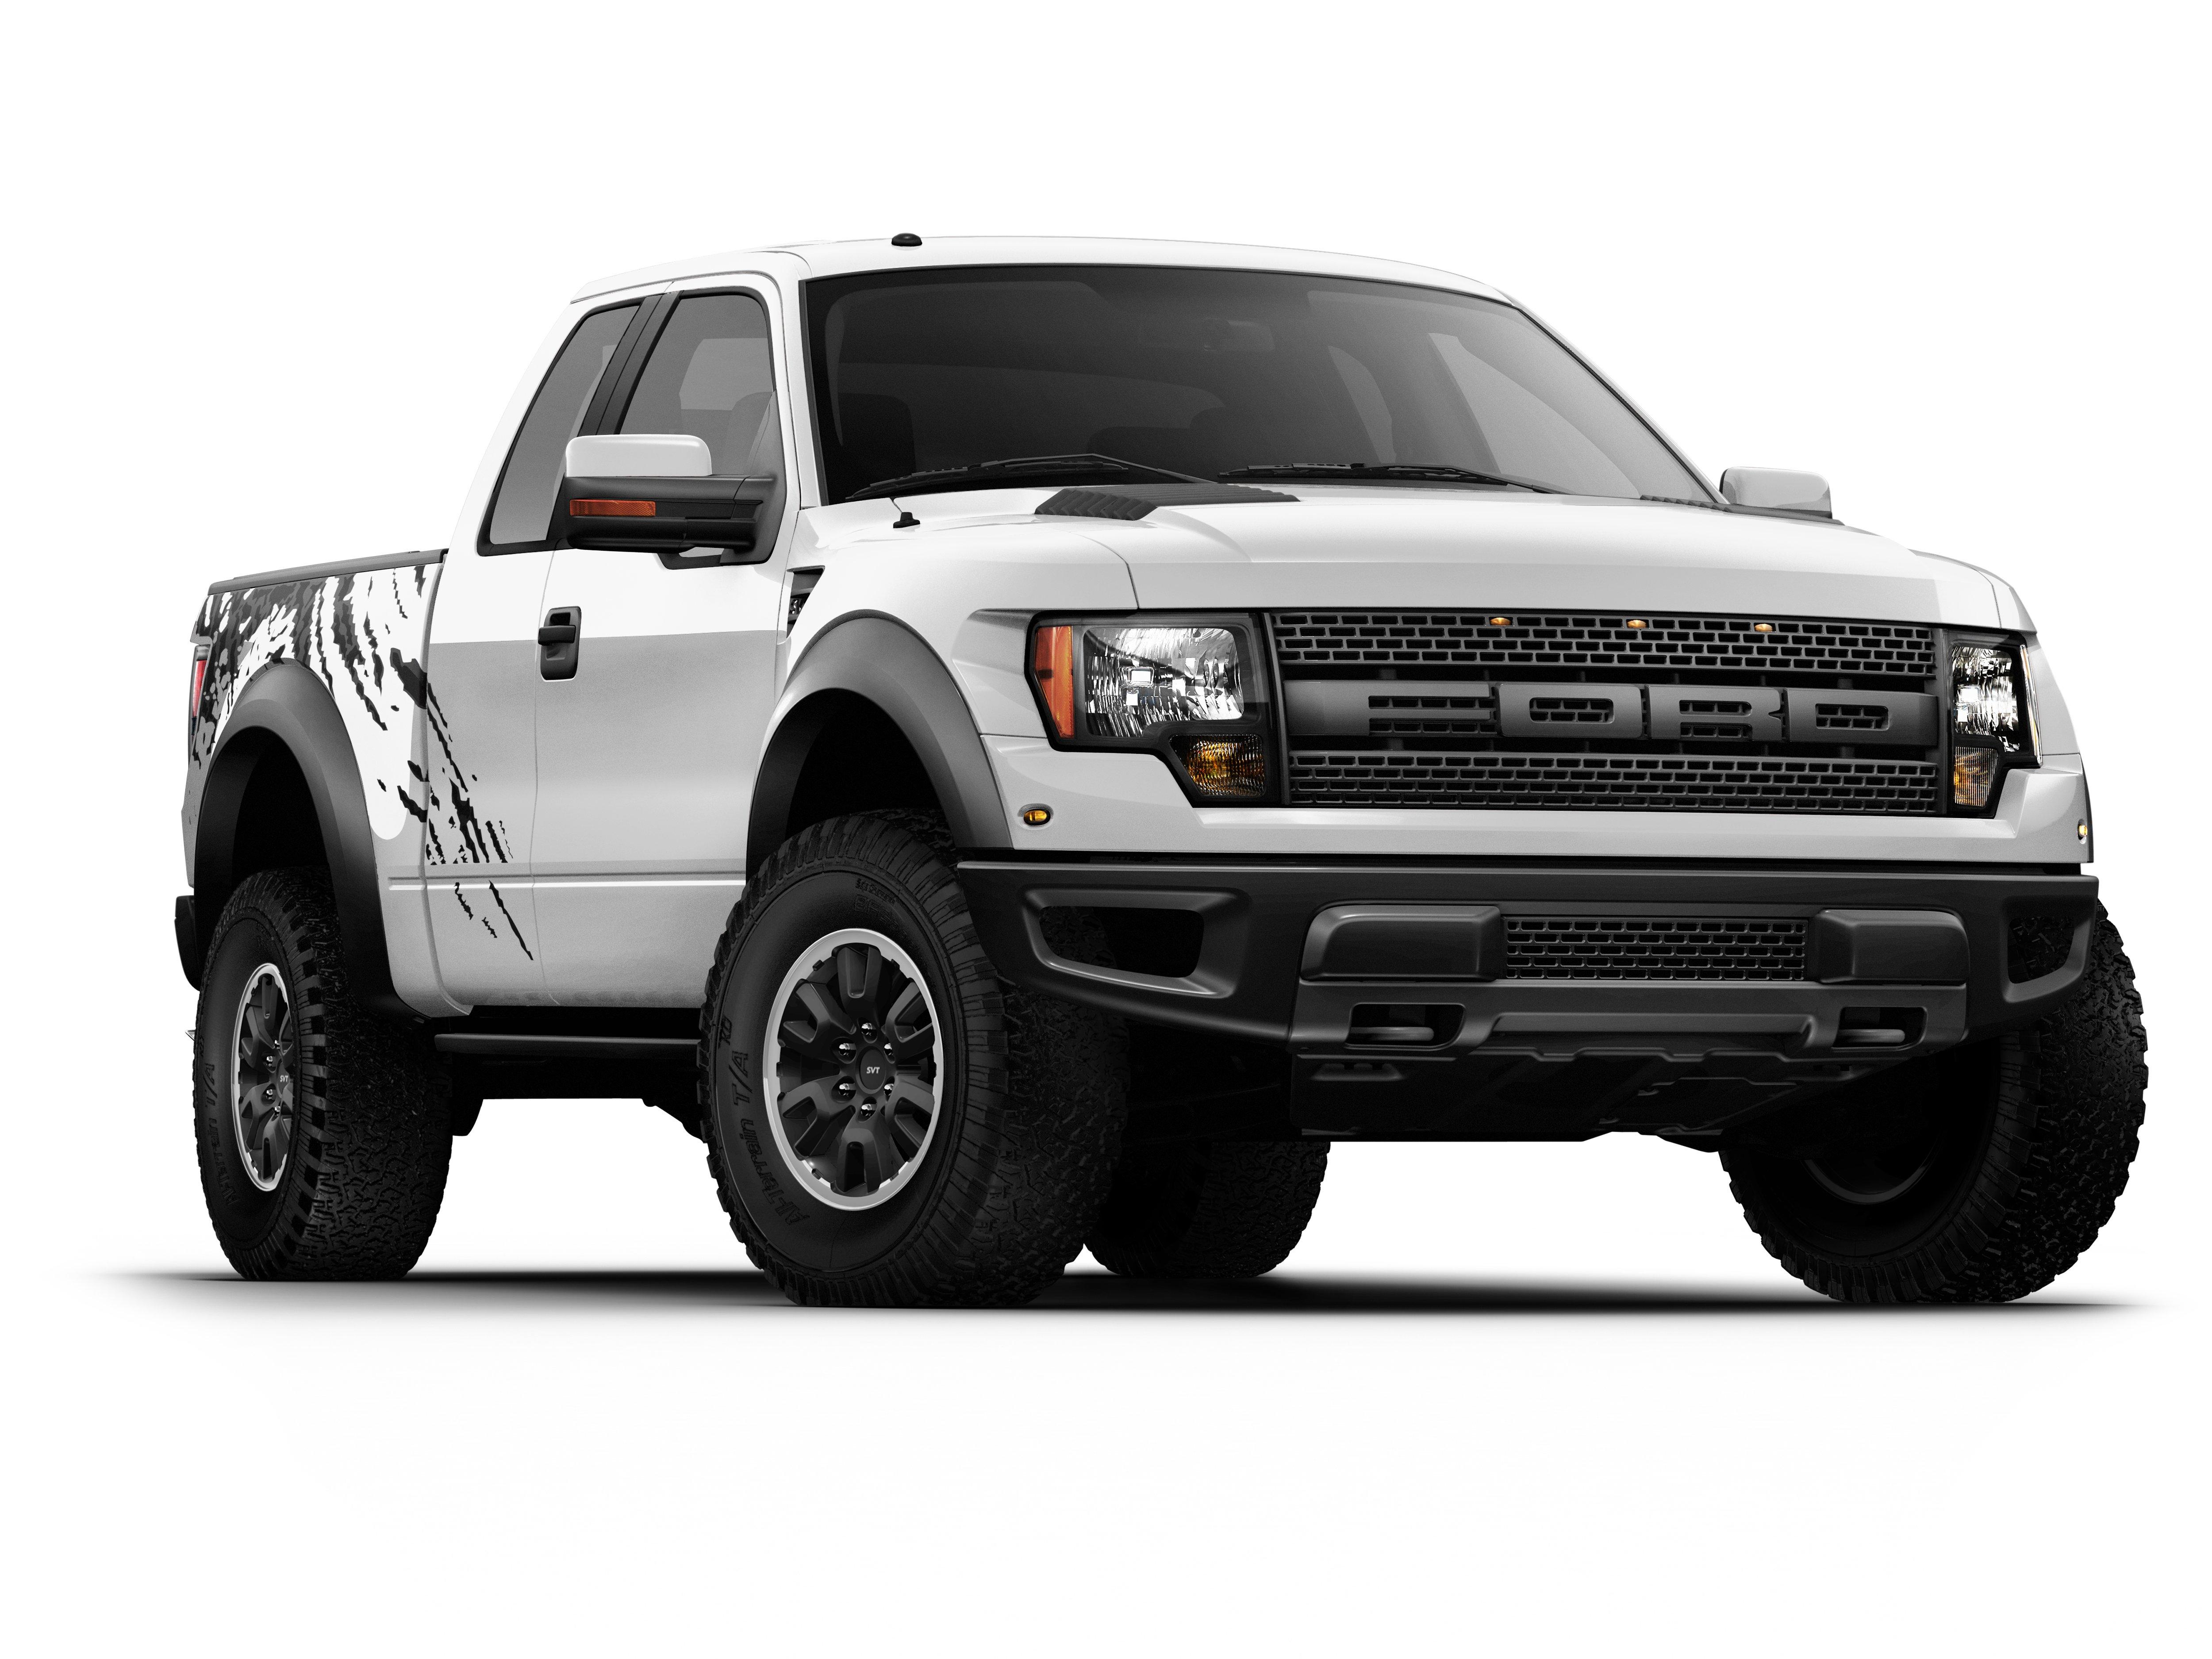 $100,000 Peak to Pavement Ford Raptor Giveaway - ilani News Room